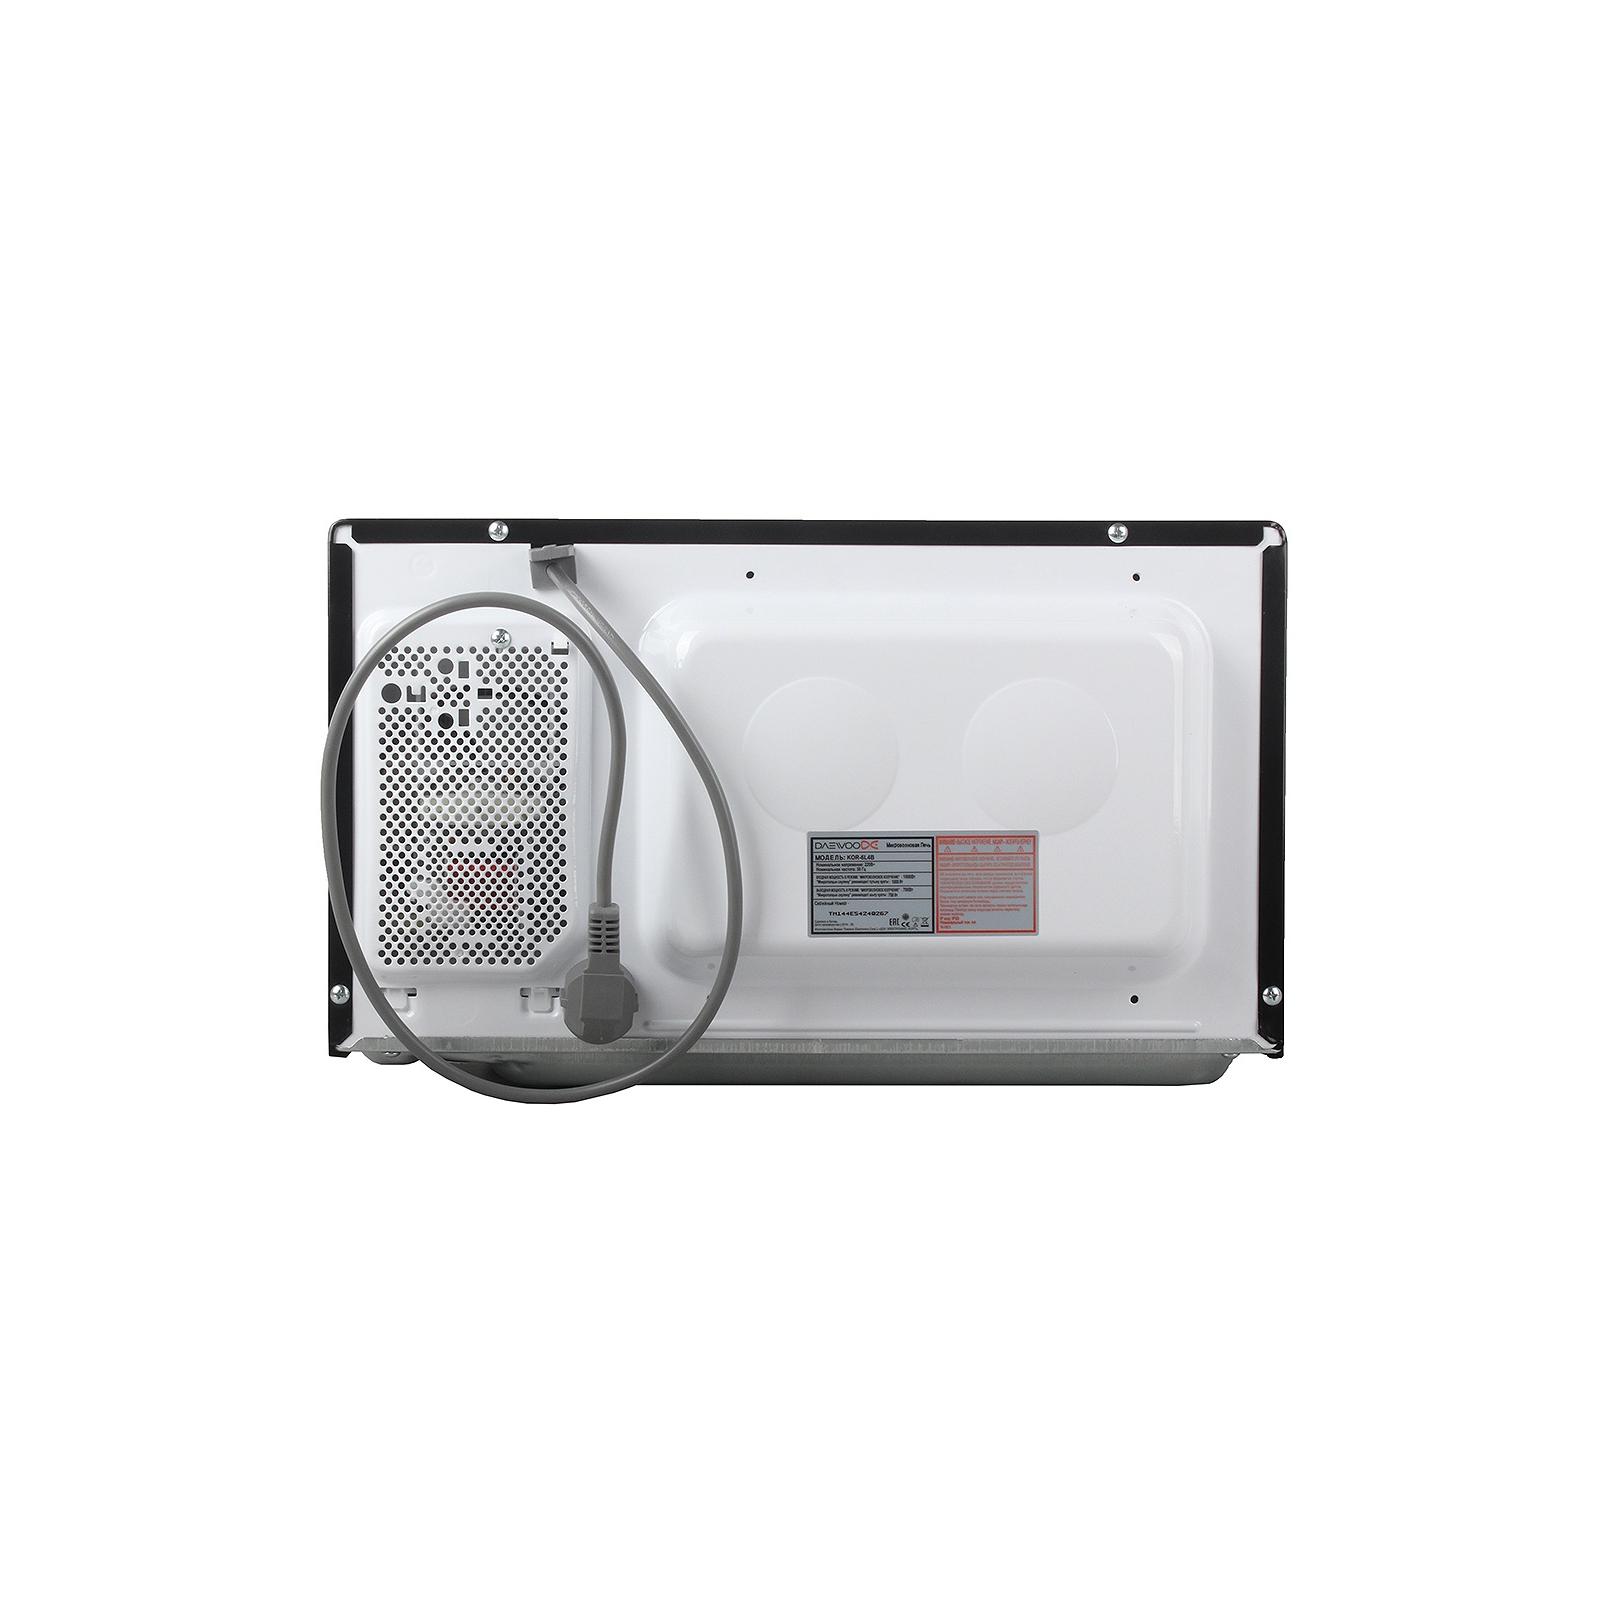 Микроволновая печь DAEWOO KQG-6L 4B (KQG-6L4B) изображение 3